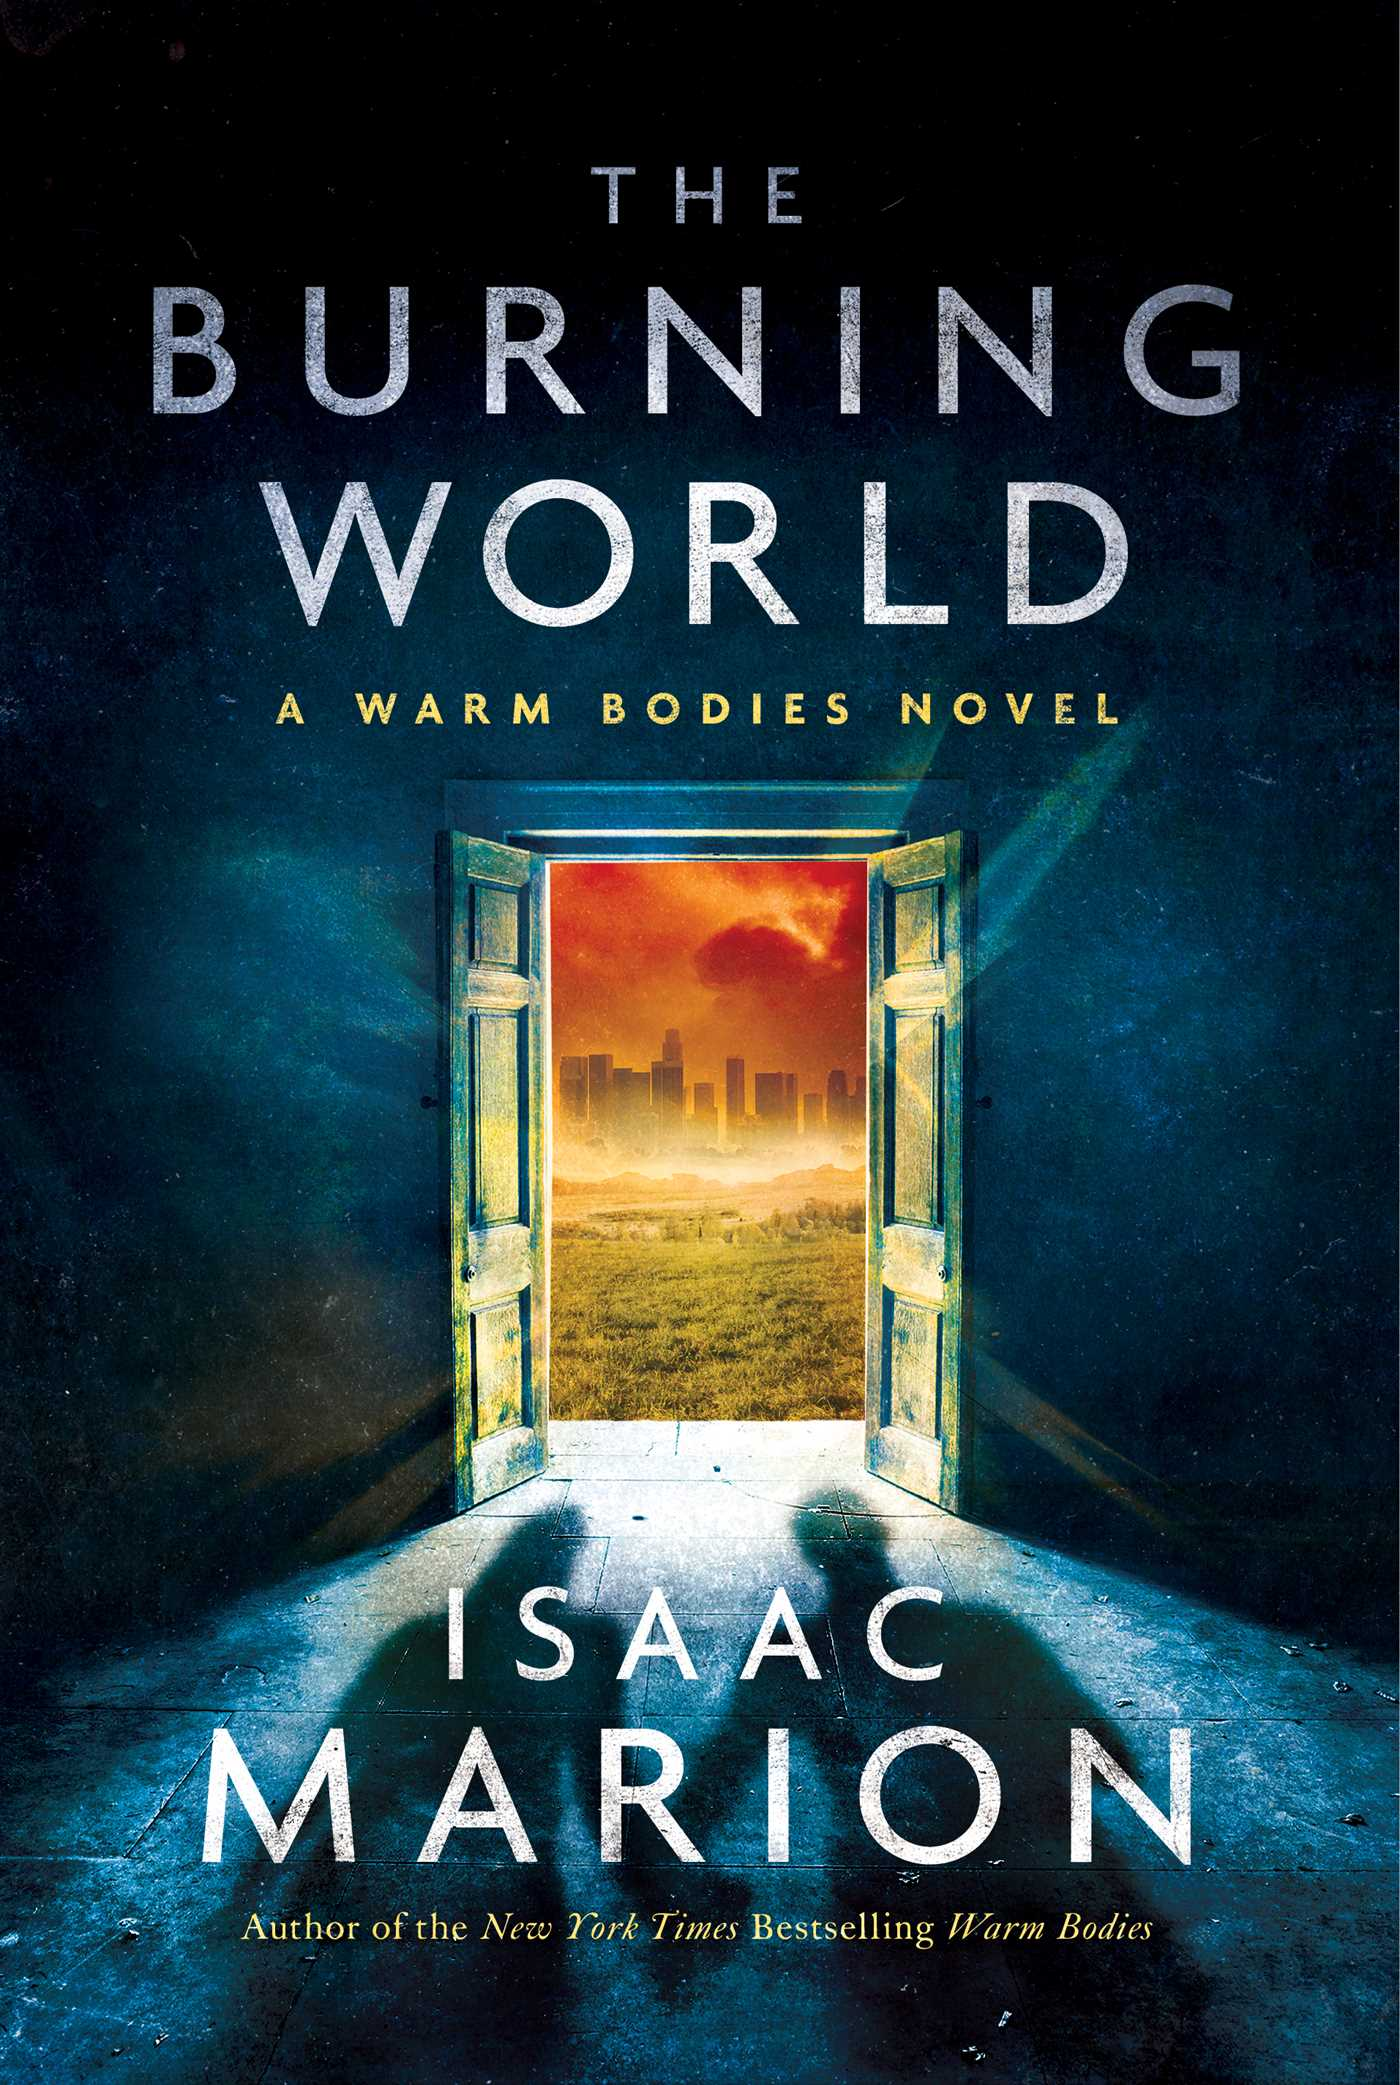 The burning world 9781476799711 hr